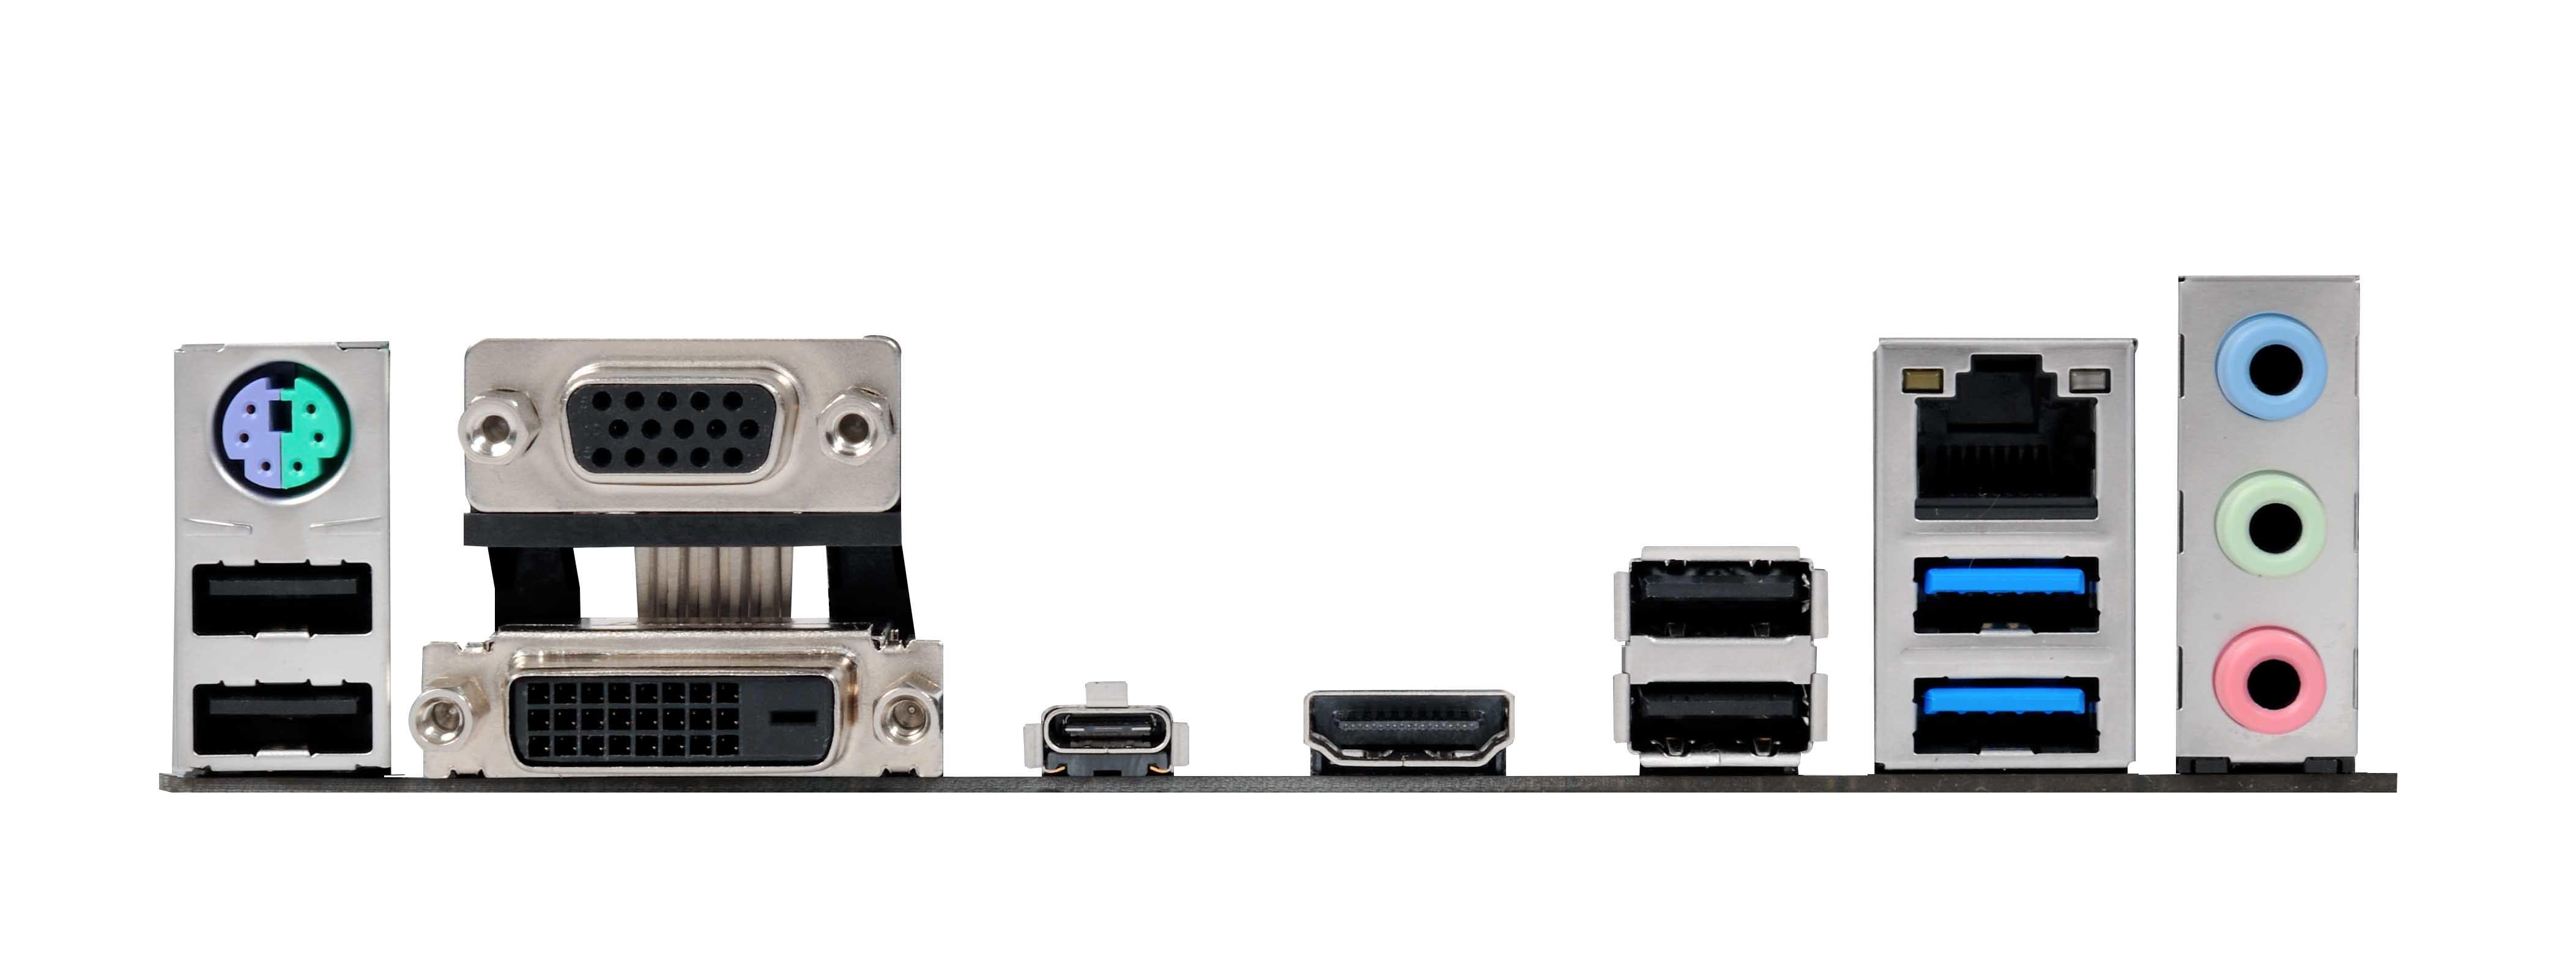 Carte mère PRIME B250-PLUS Socket 1151 - Chipset B250 Kabylake